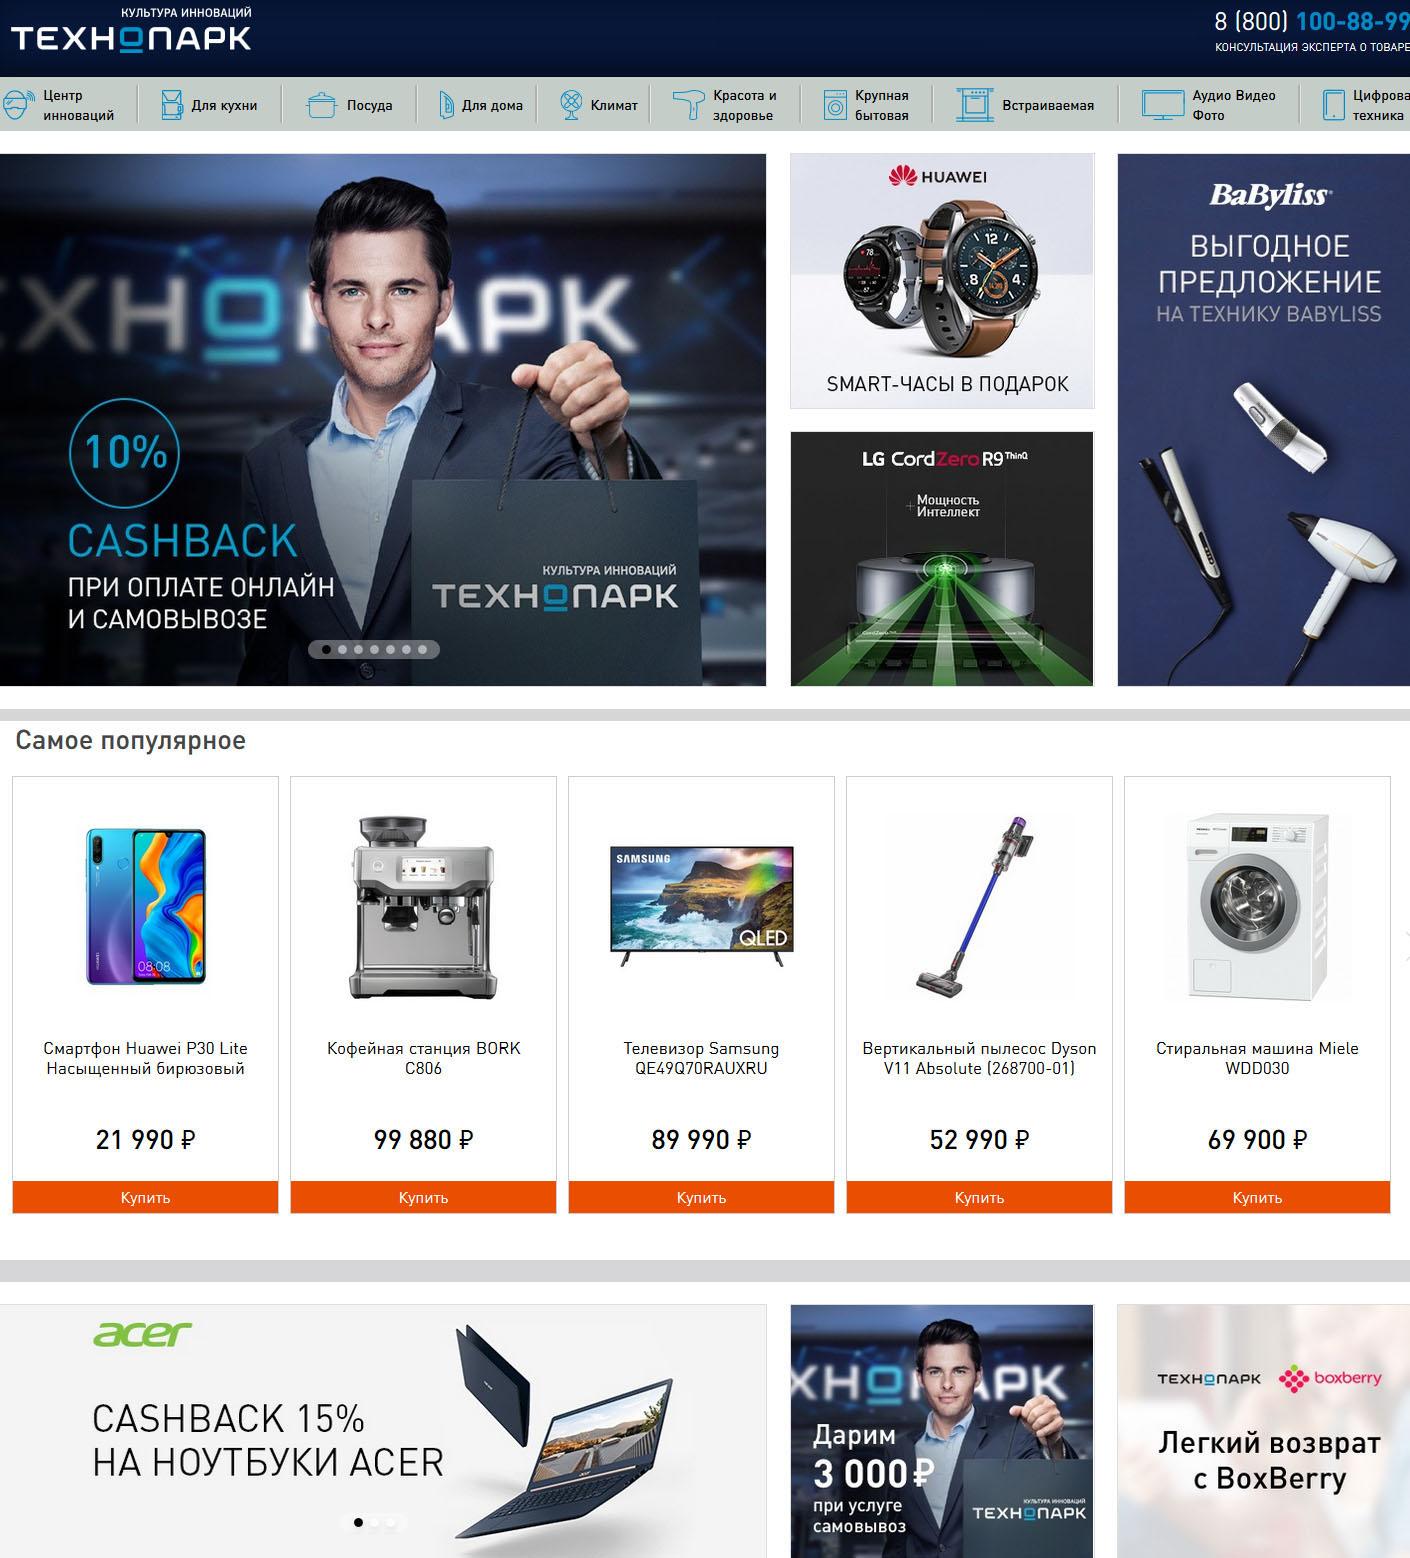 Интернет-магазин Технопарк